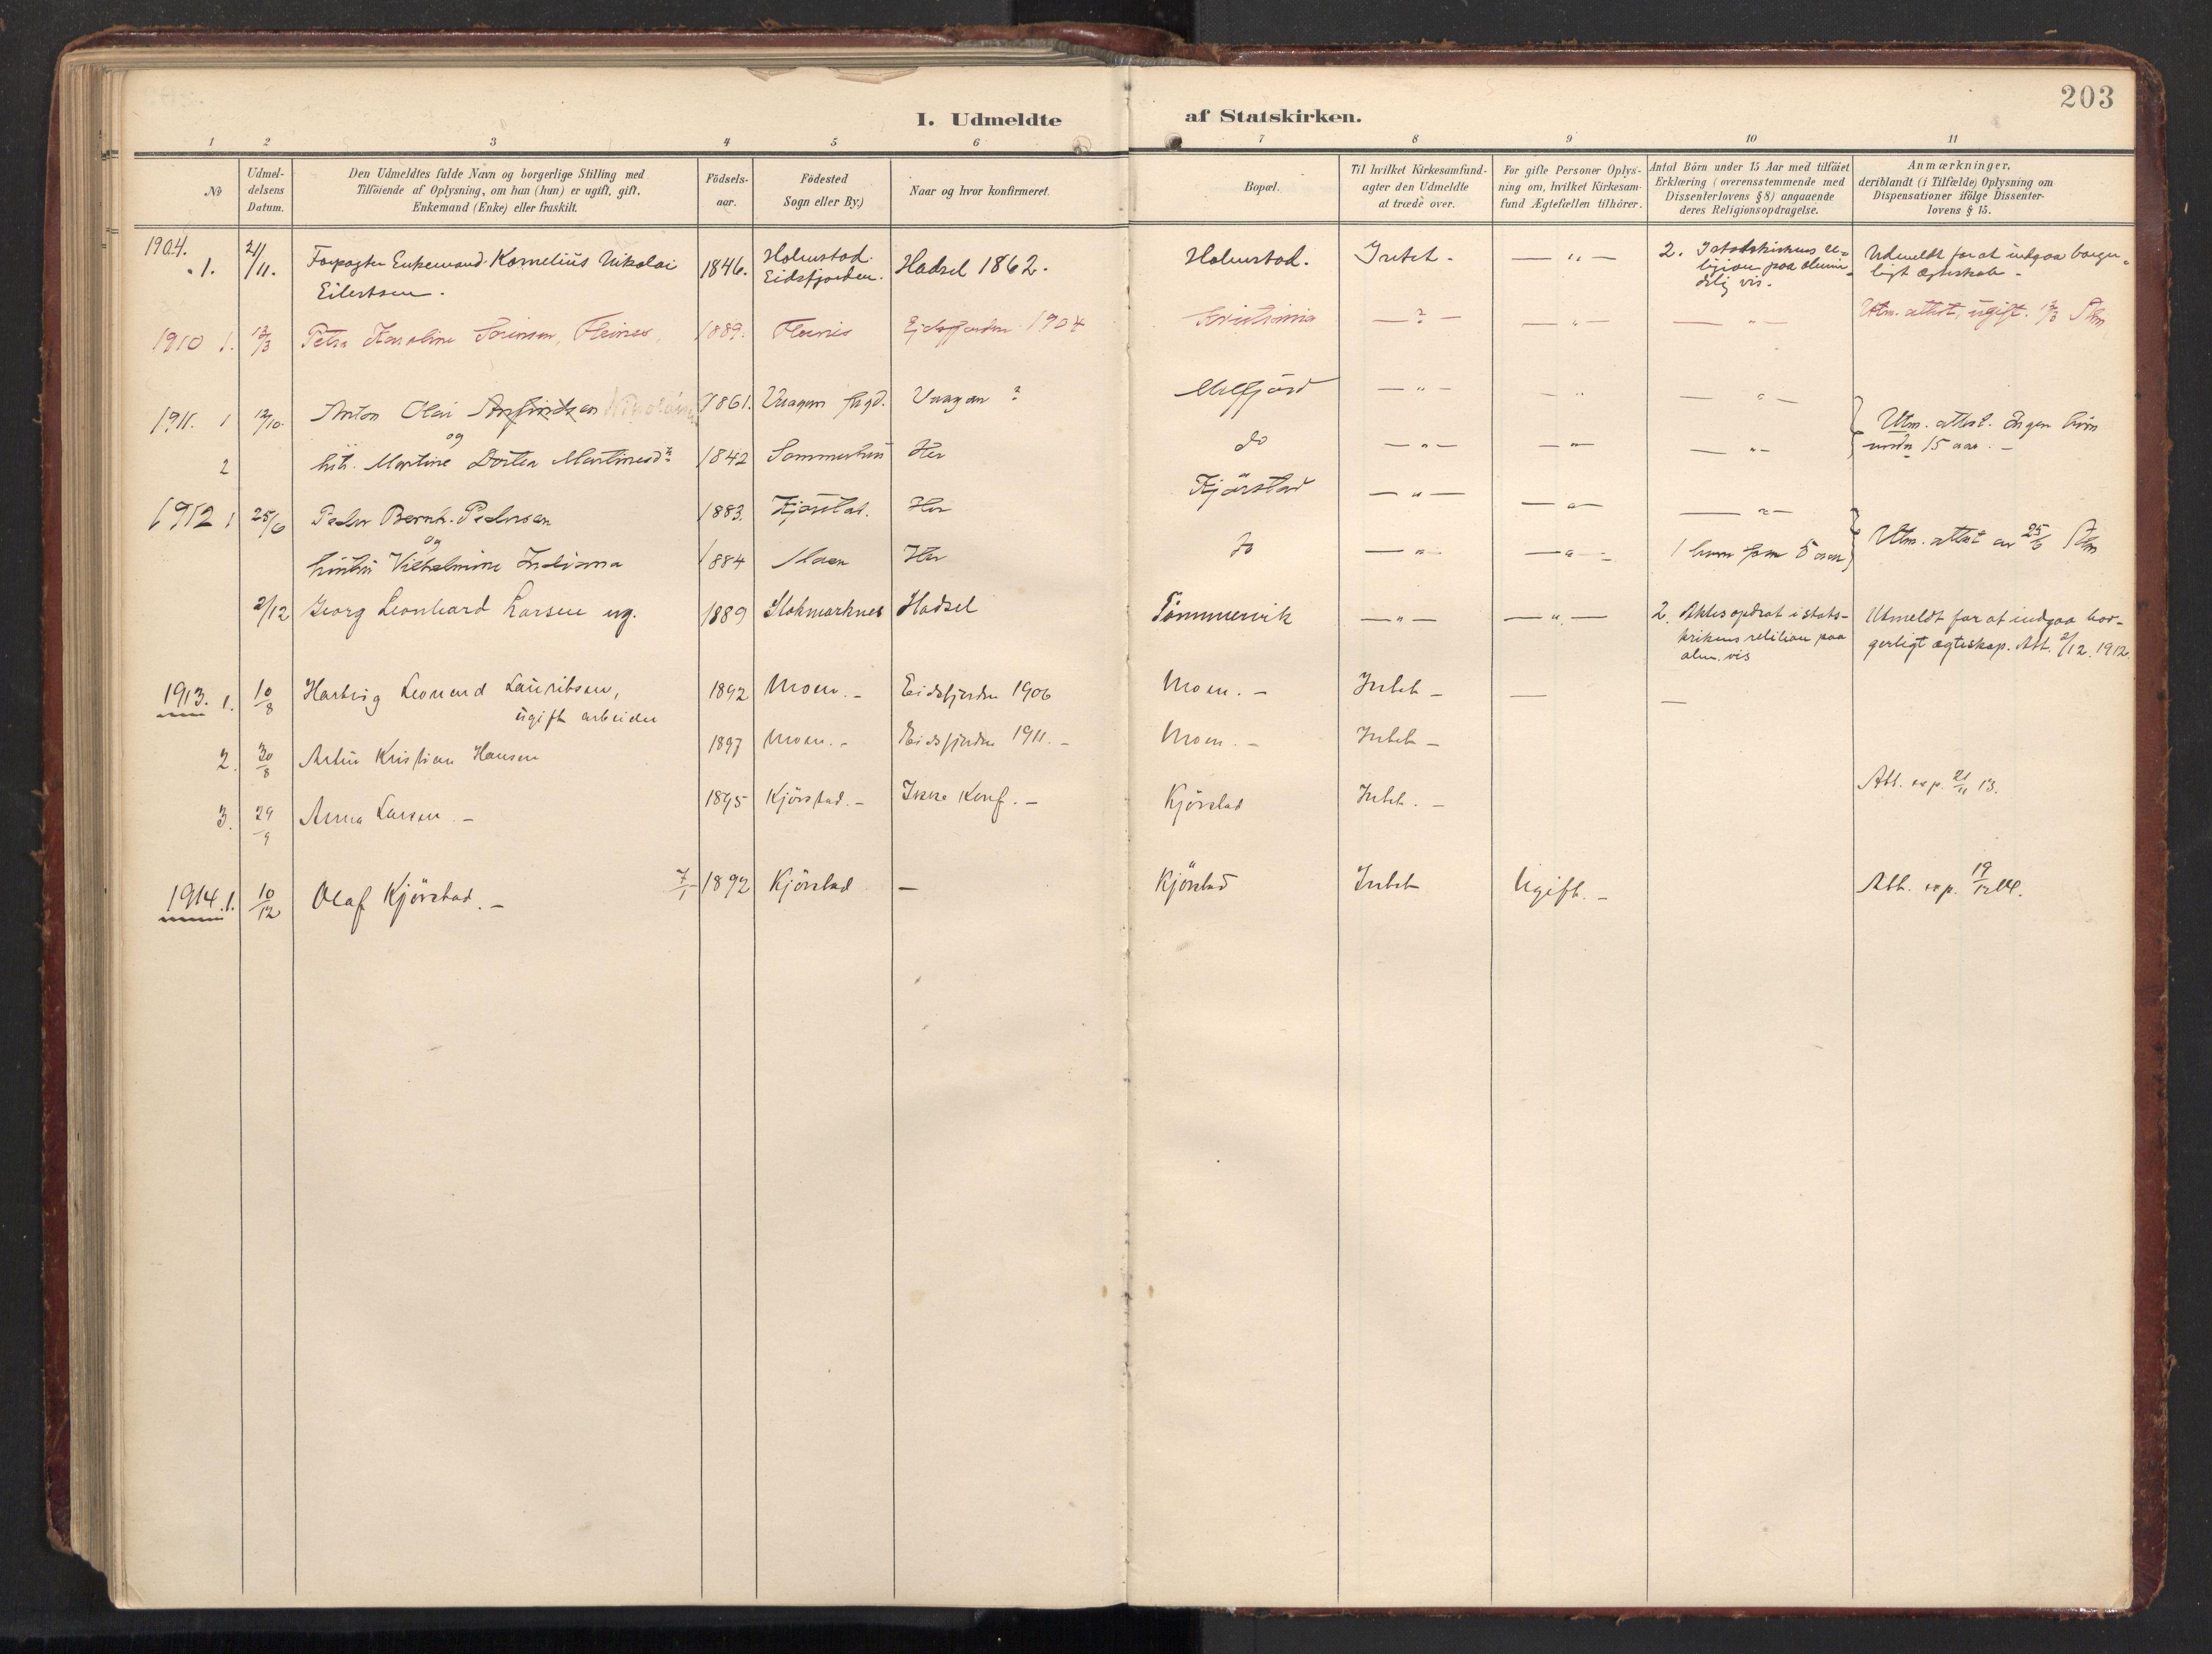 SAT, Ministerialprotokoller, klokkerbøker og fødselsregistre - Nordland, 890/L1287: Ministerialbok nr. 890A02, 1903-1915, s. 203